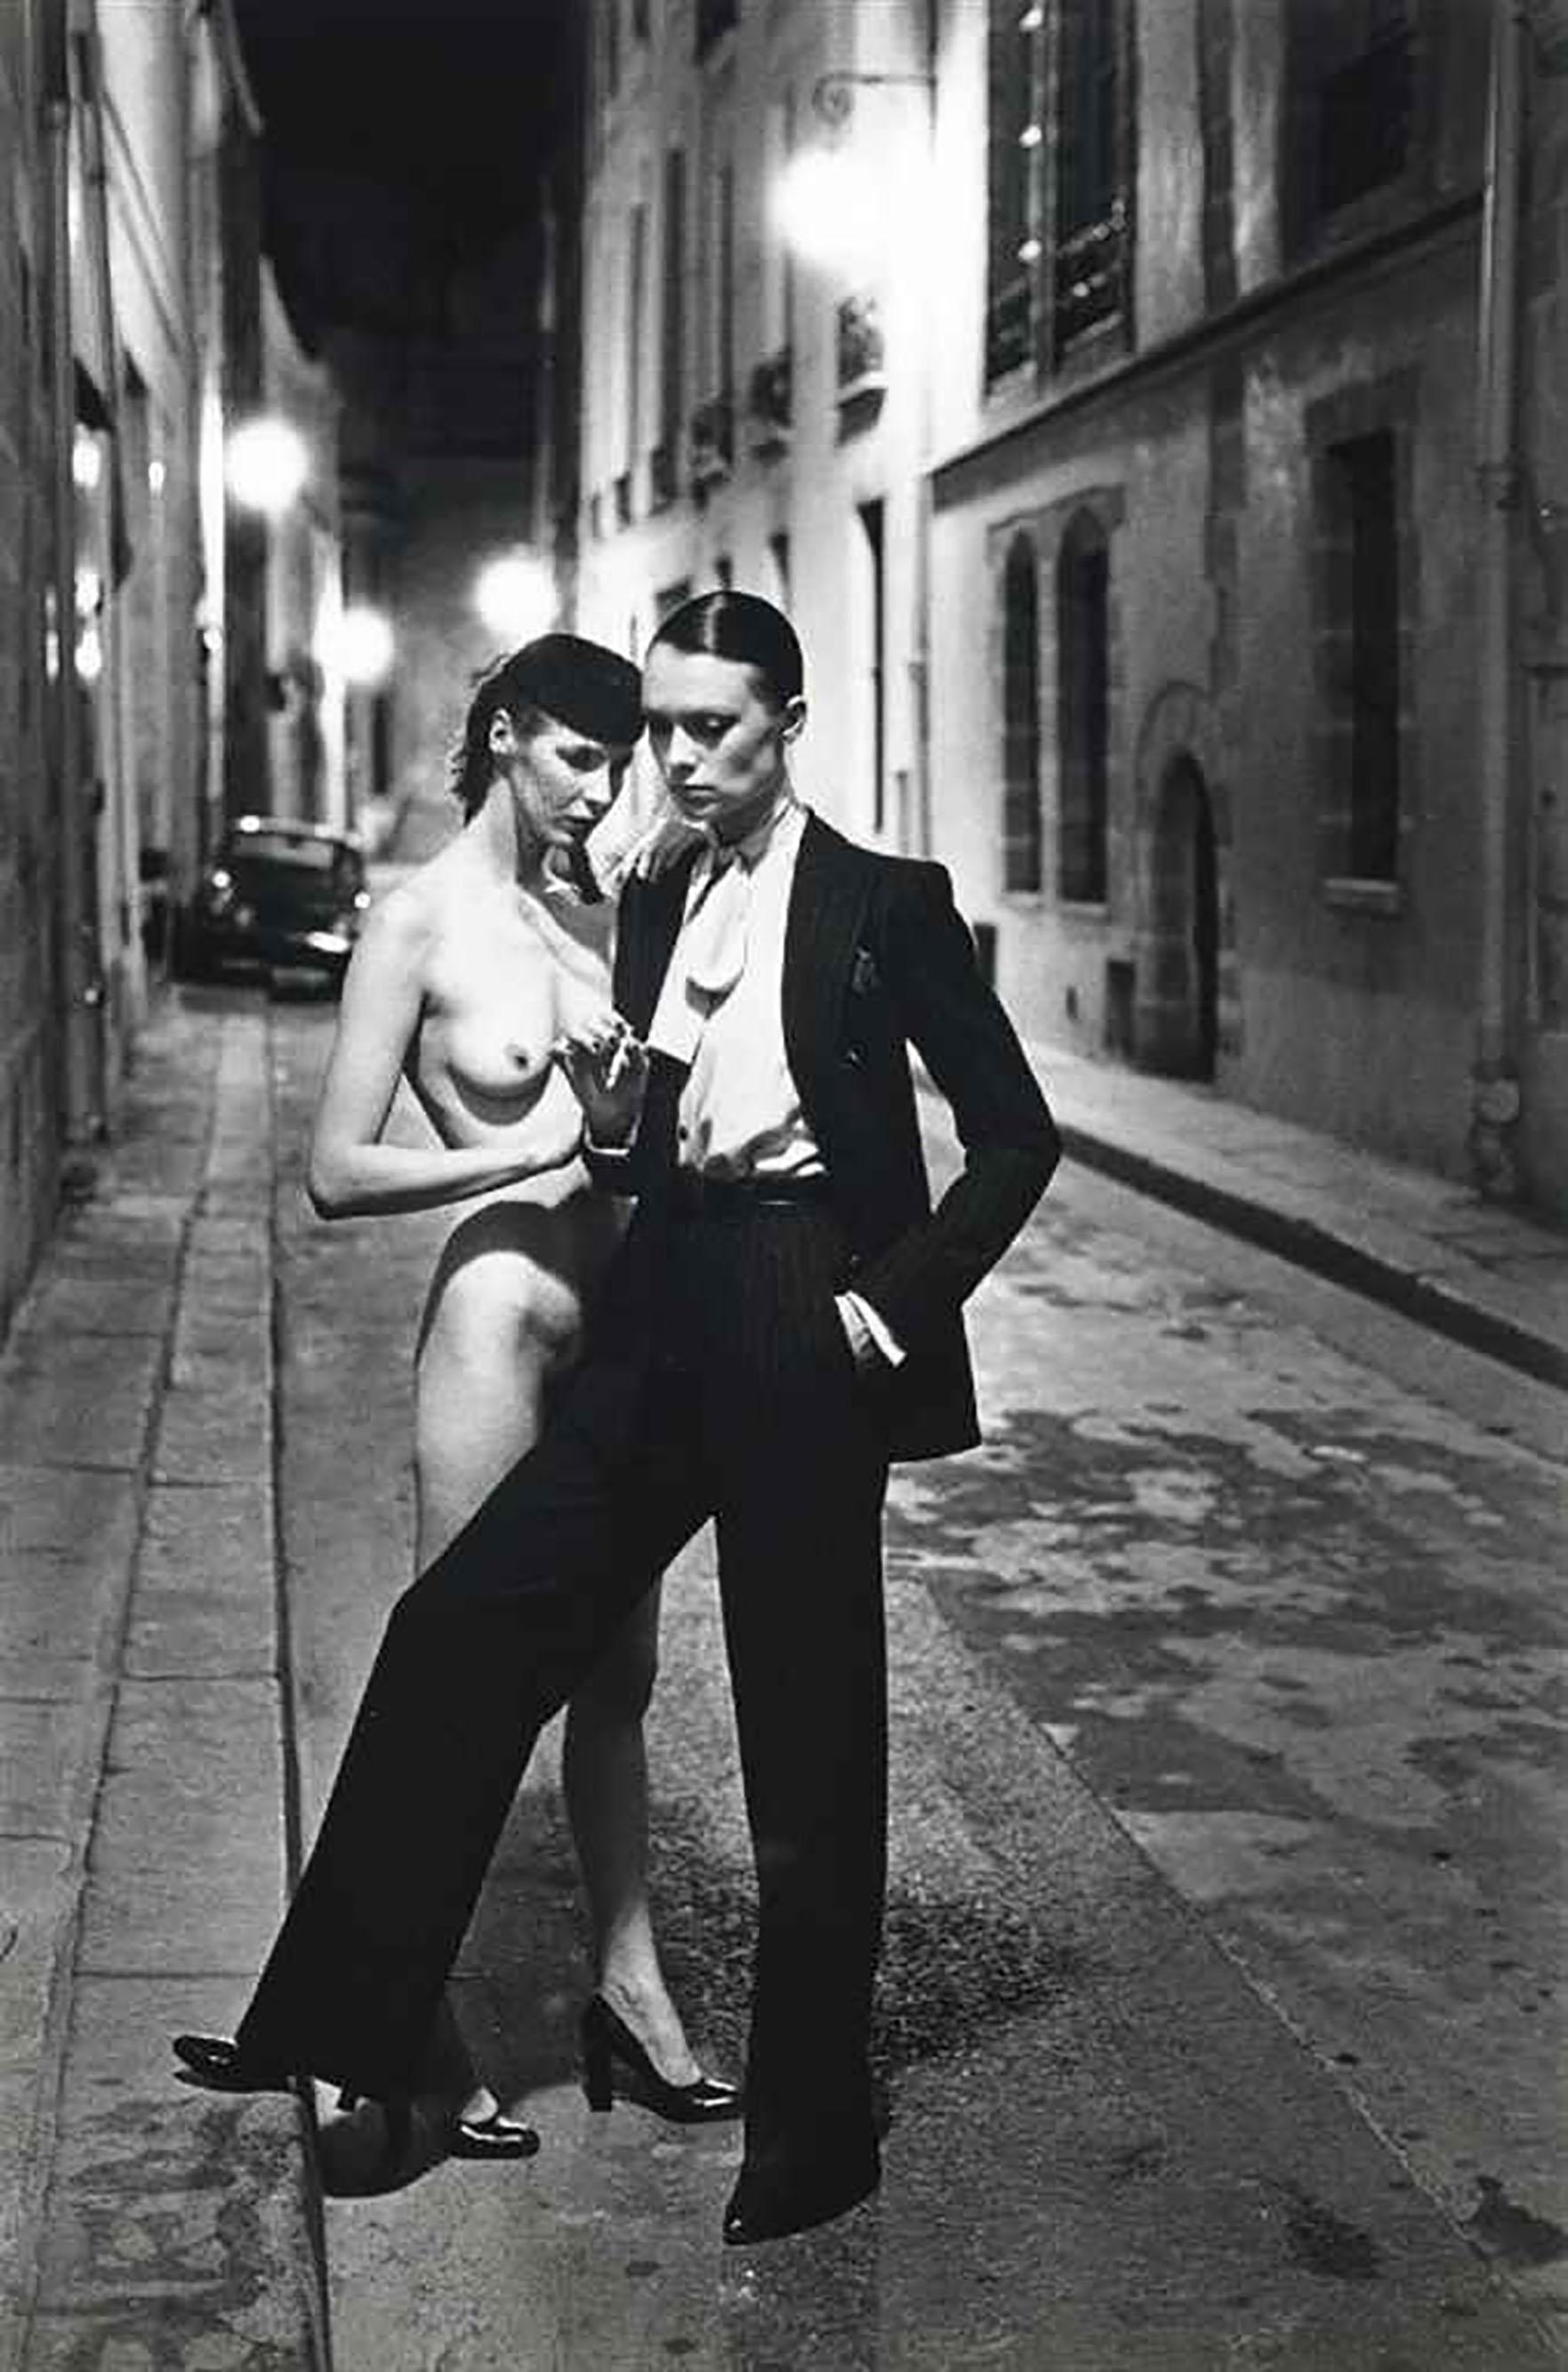 Helmut Newton, 'Rue Aubriot', 1975 (Signed)